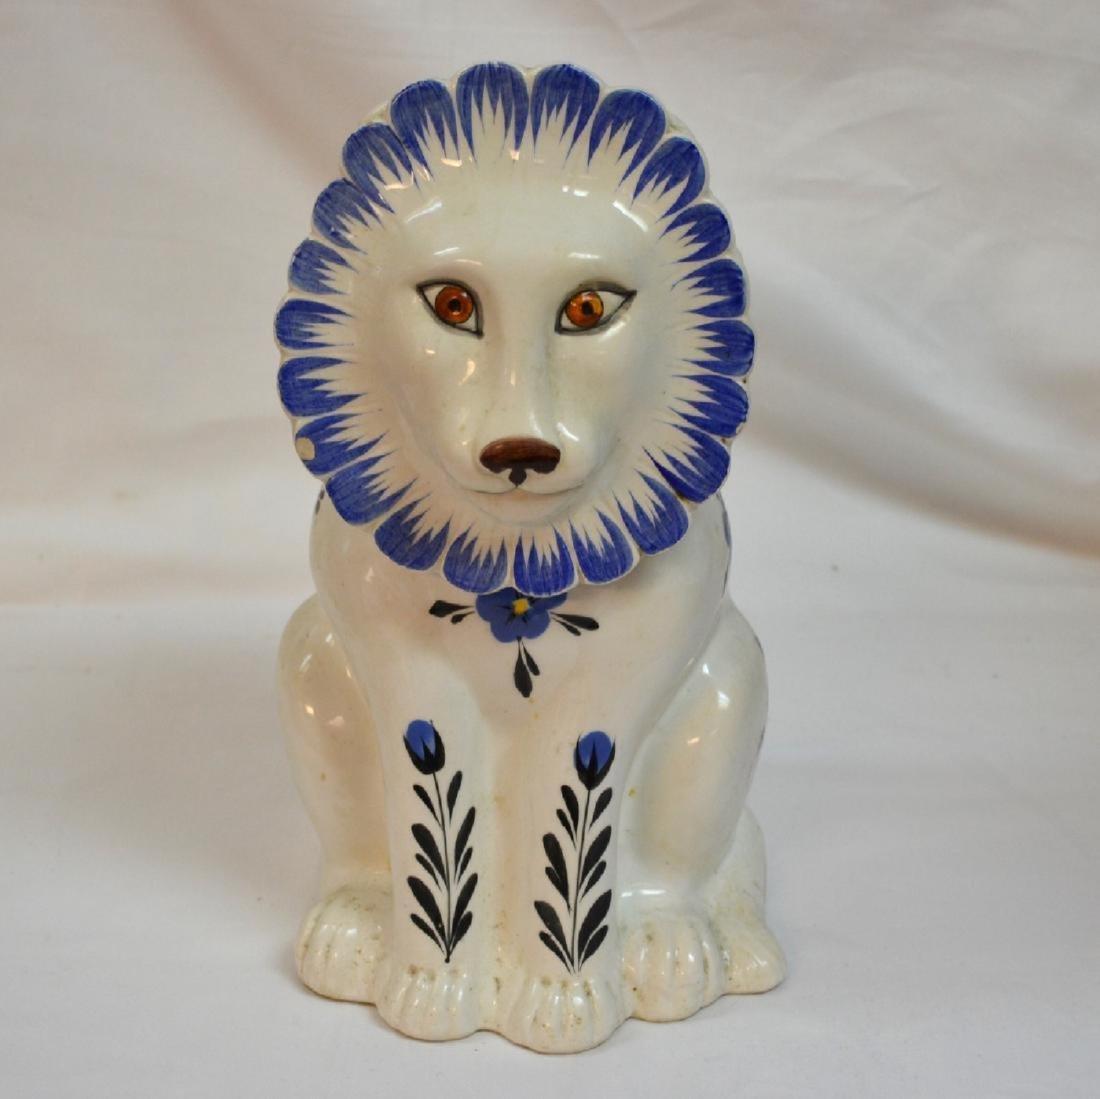 Mancer Ceramic Lion Cookie Jar . Made in Italy